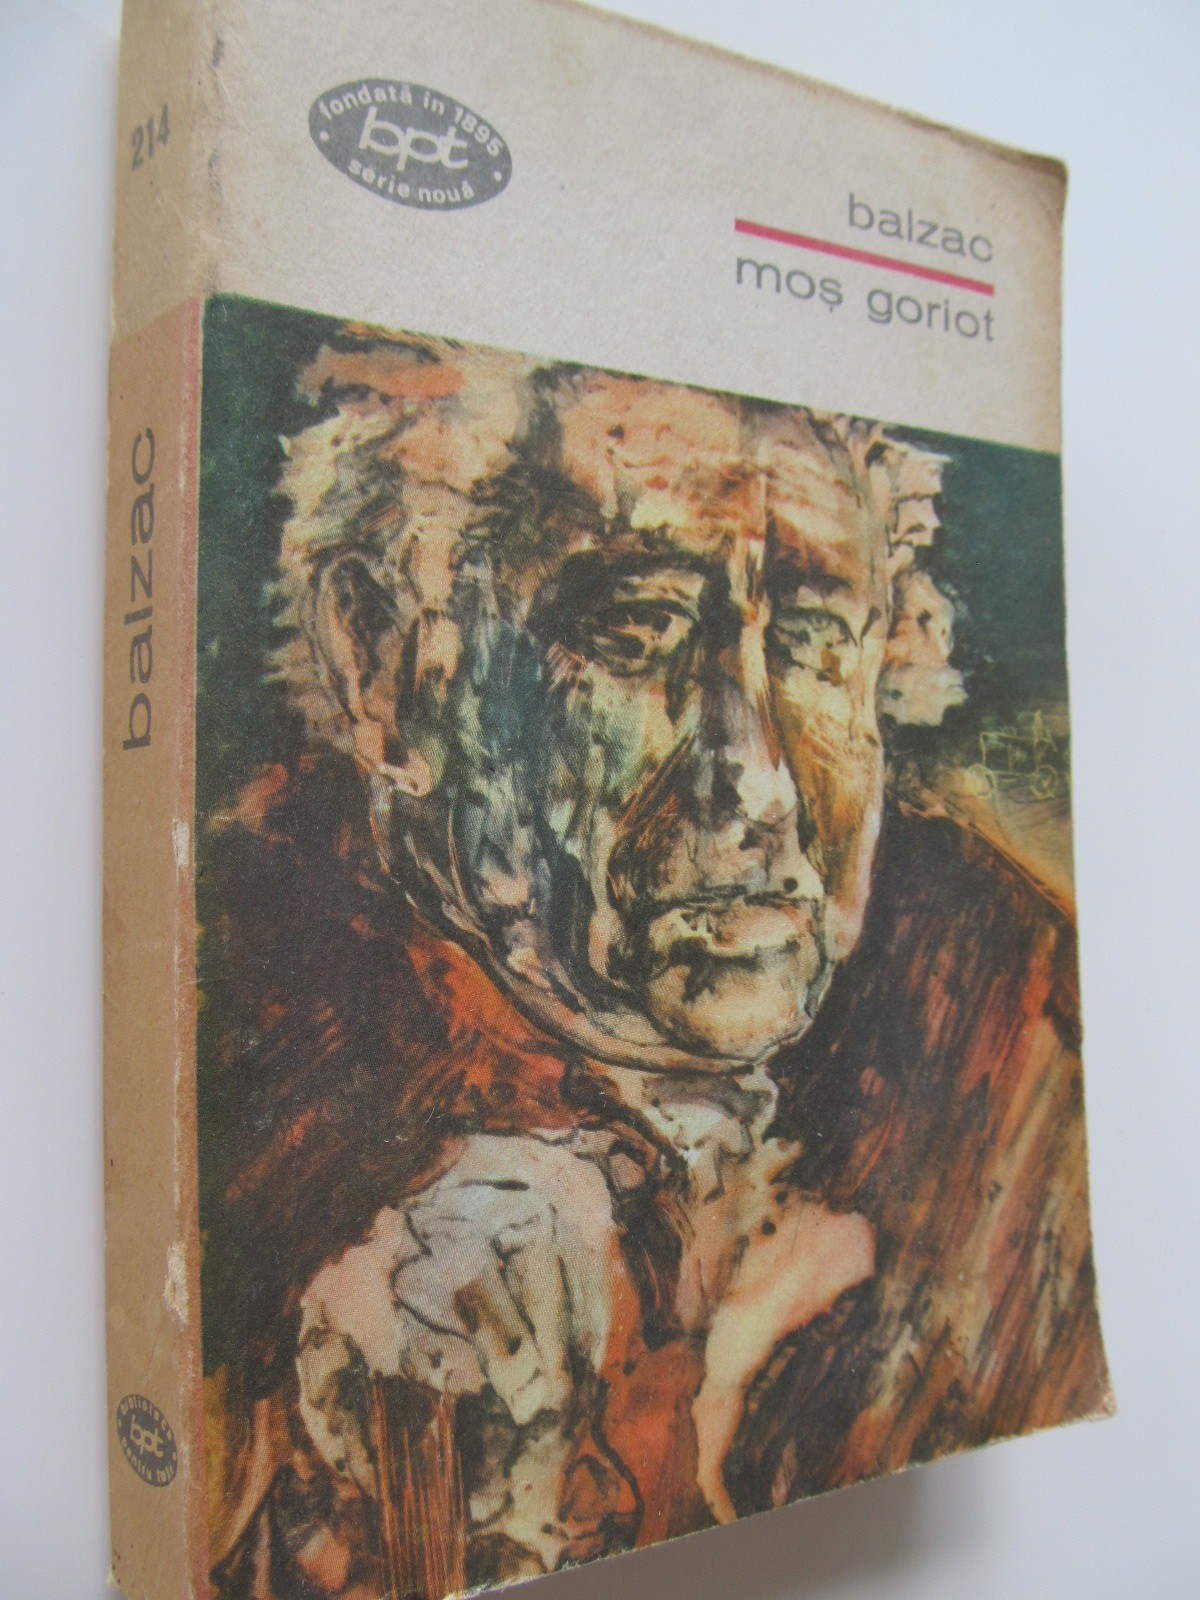 Carte Mos Goriot - Balzac